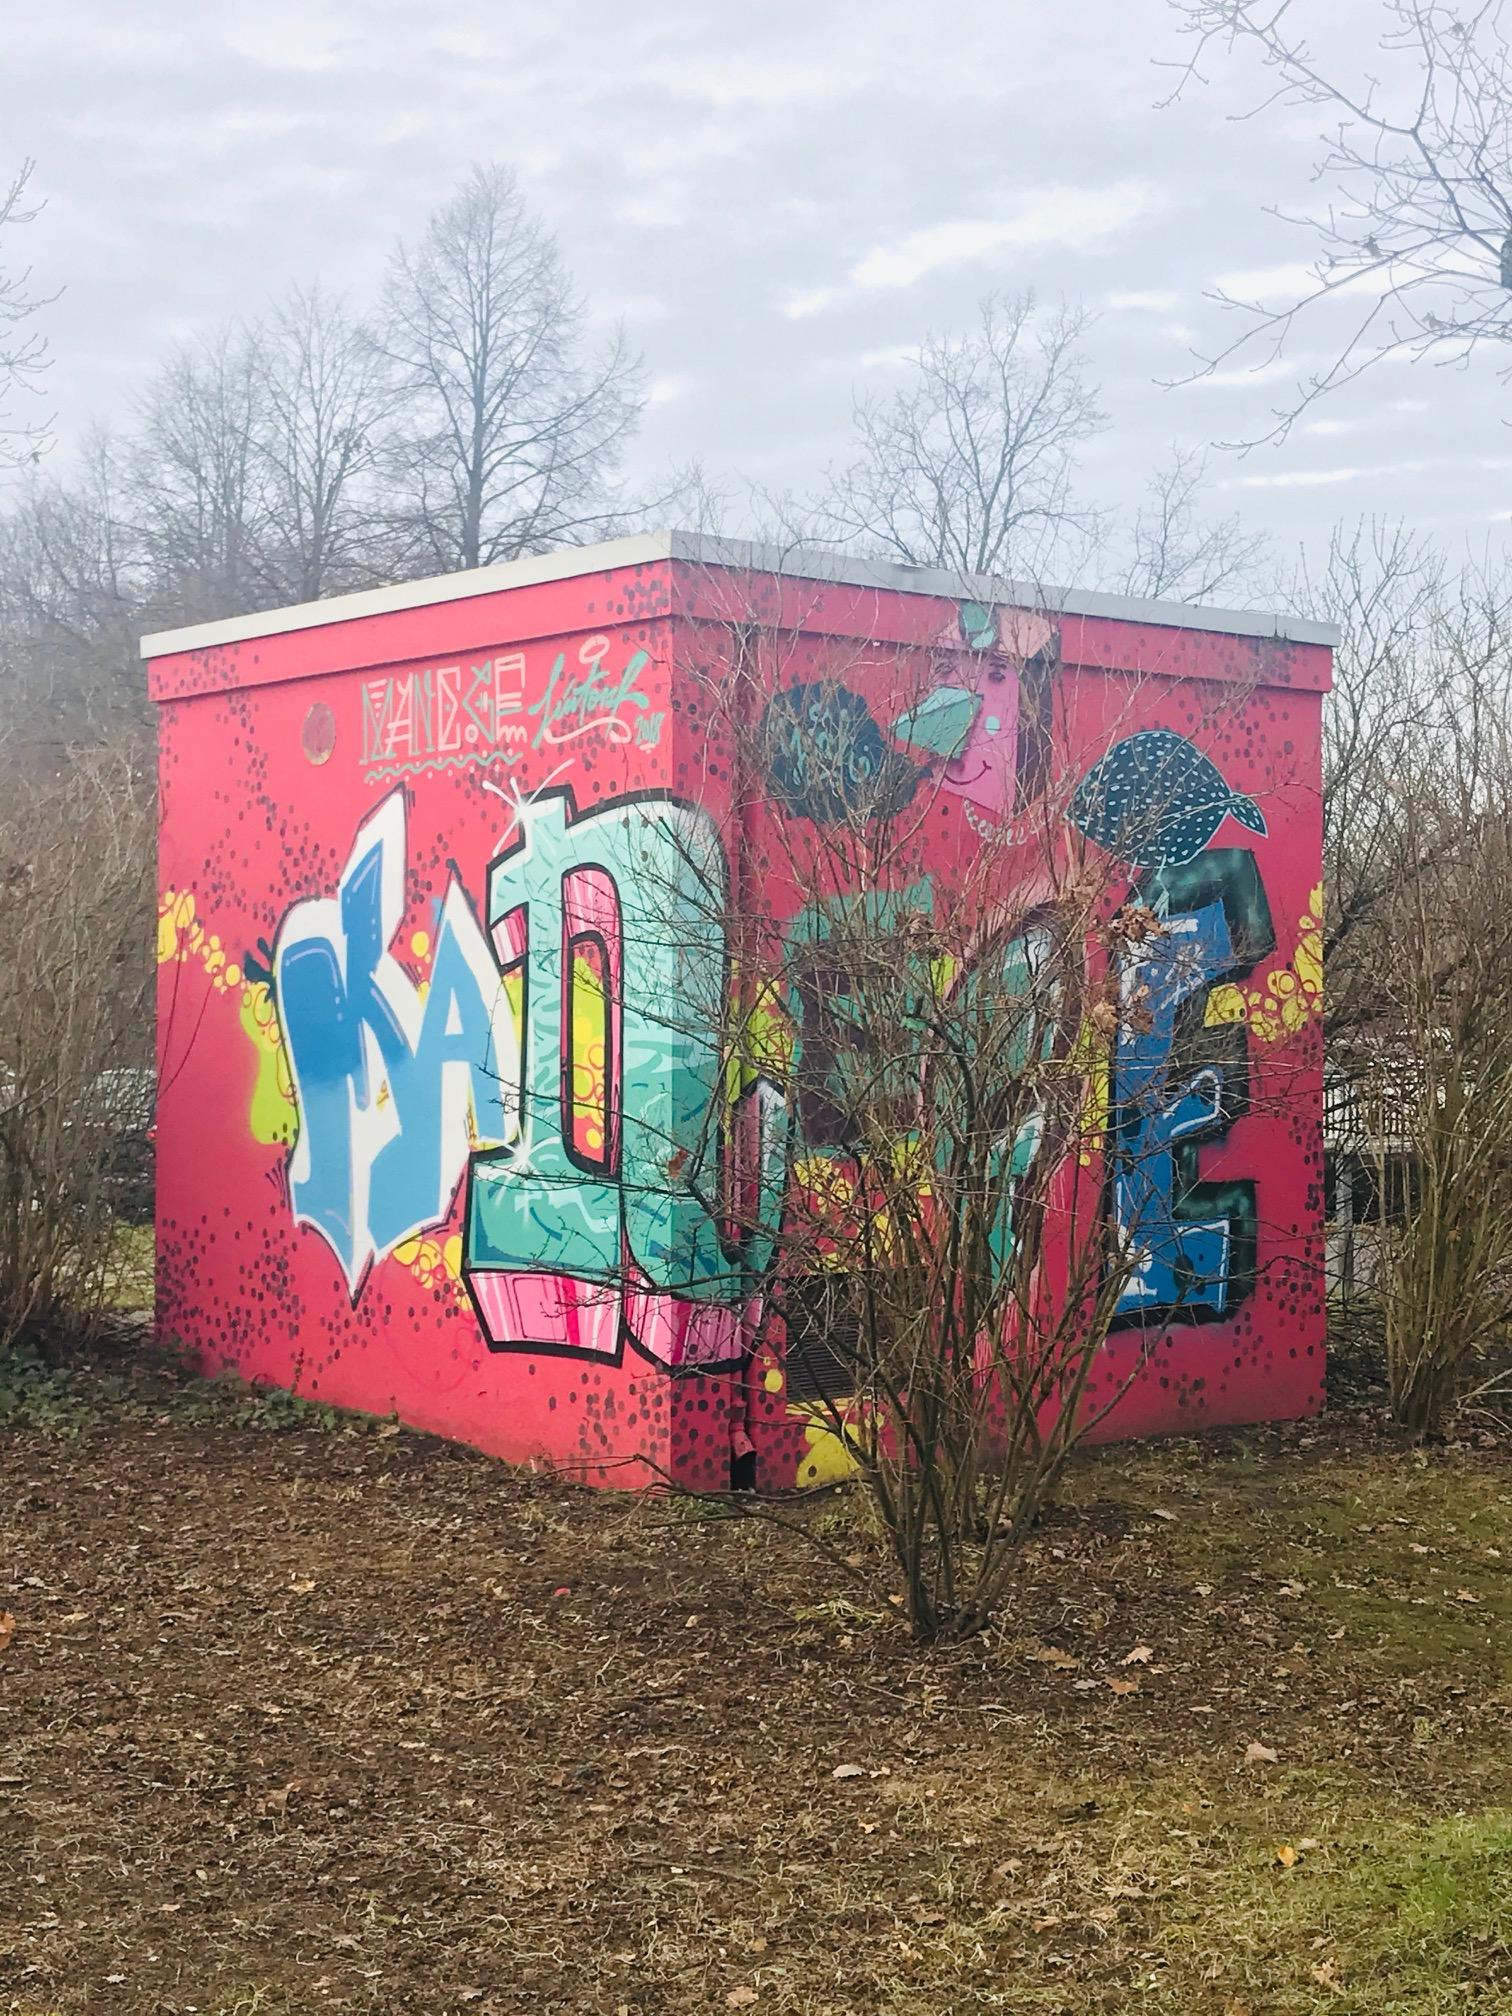 jugendkulturjahr-2020-ratingen-jkj2020-graffiti-trafohaeuschen-stadtwerke-ratingen